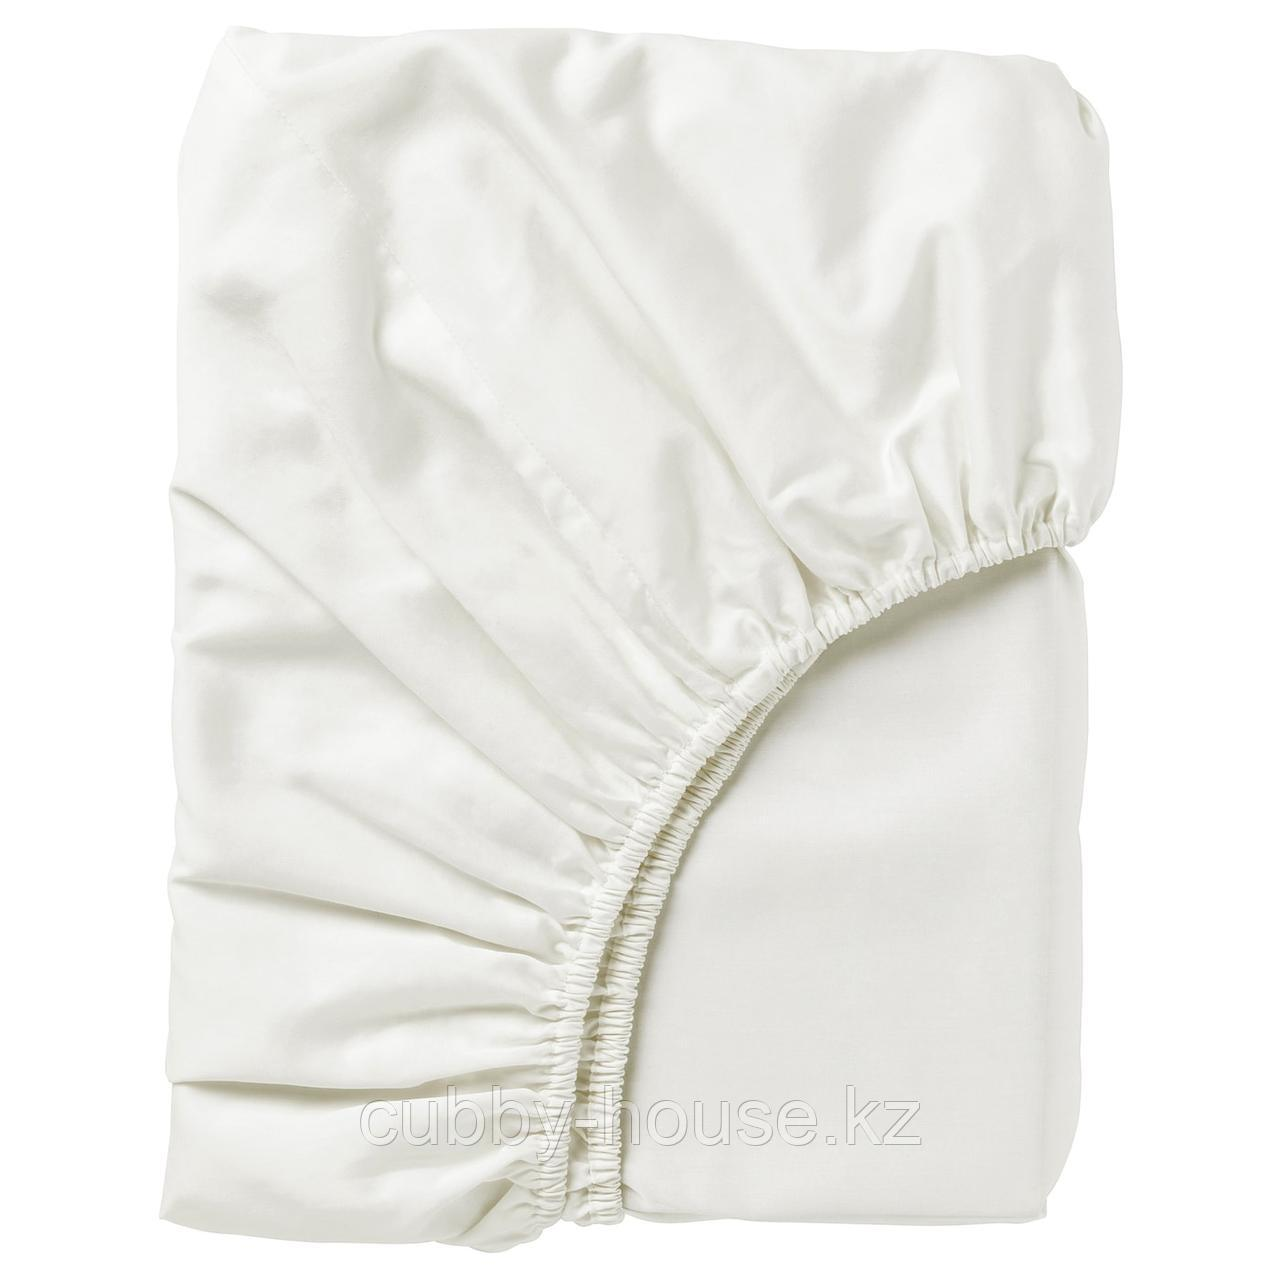 НАТТЭСМИН Простыня натяжная, белый, 90x200 см